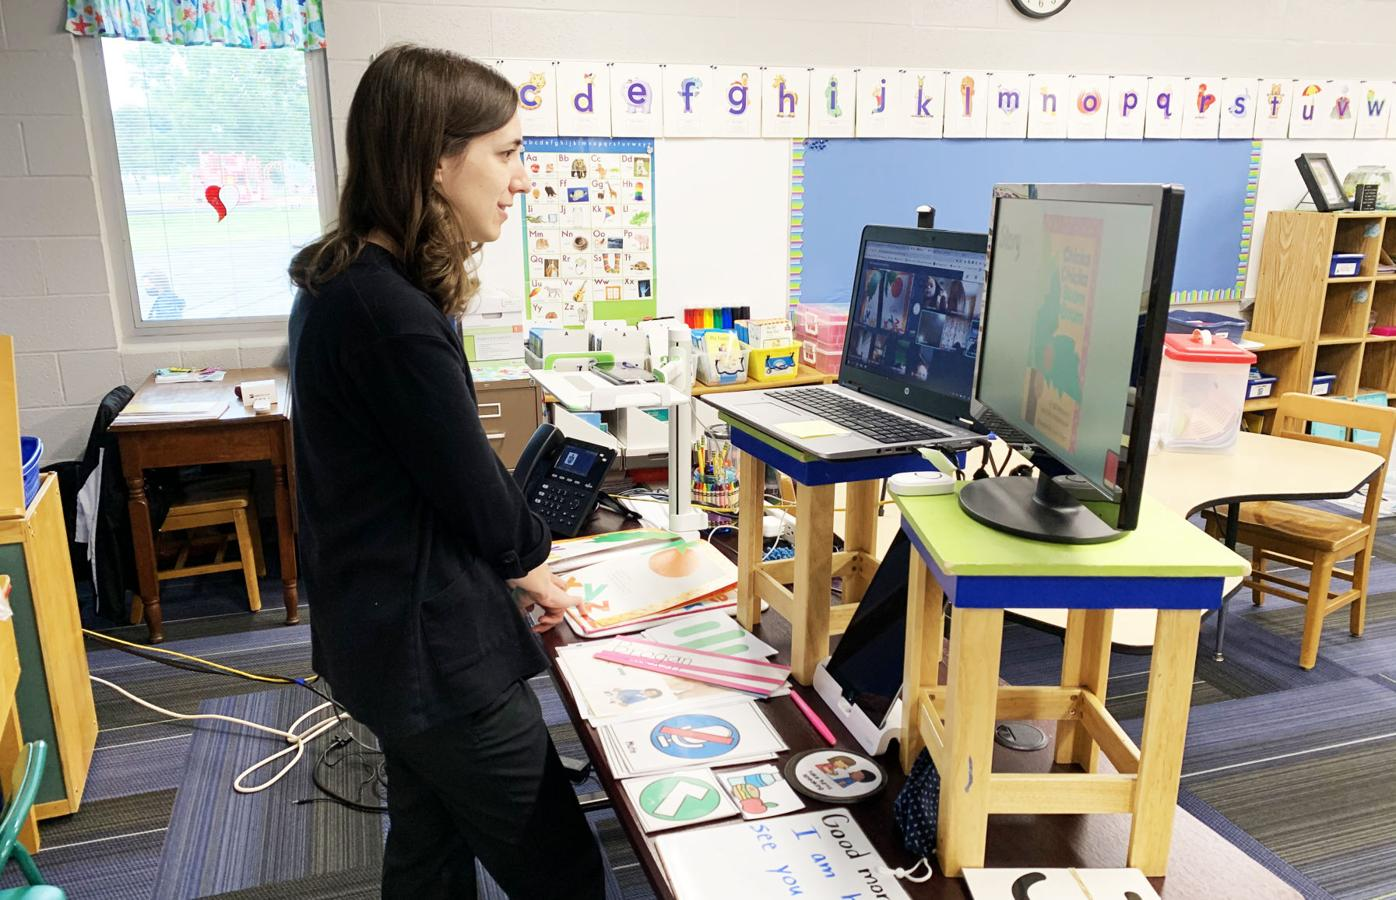 St. Peter Public Schools Distance Learning